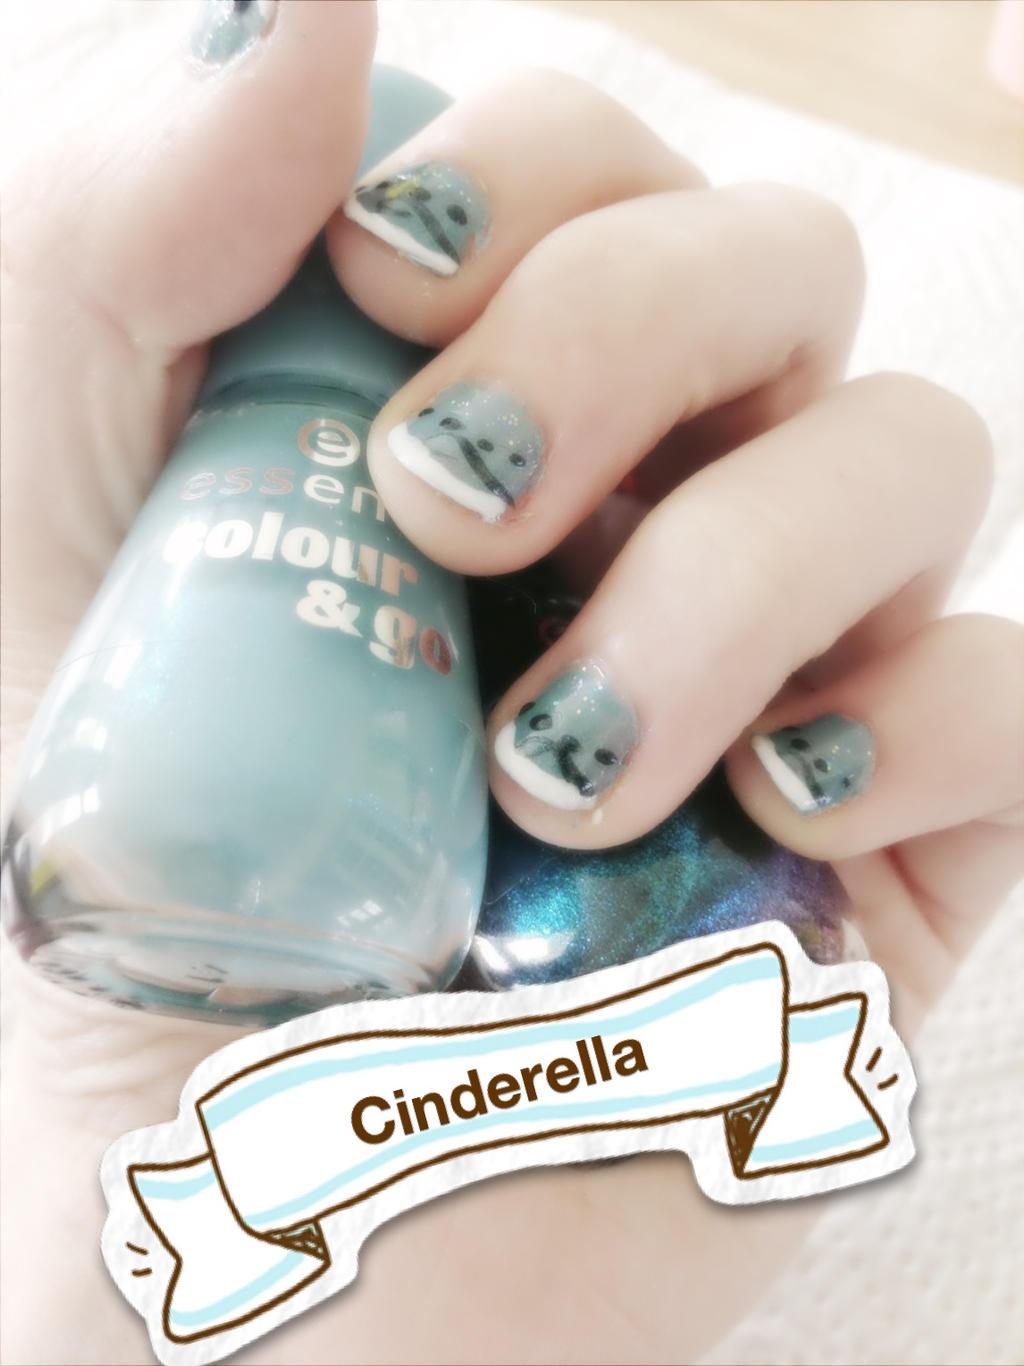 Cinderella Nail Art by Morbylover on DeviantArt